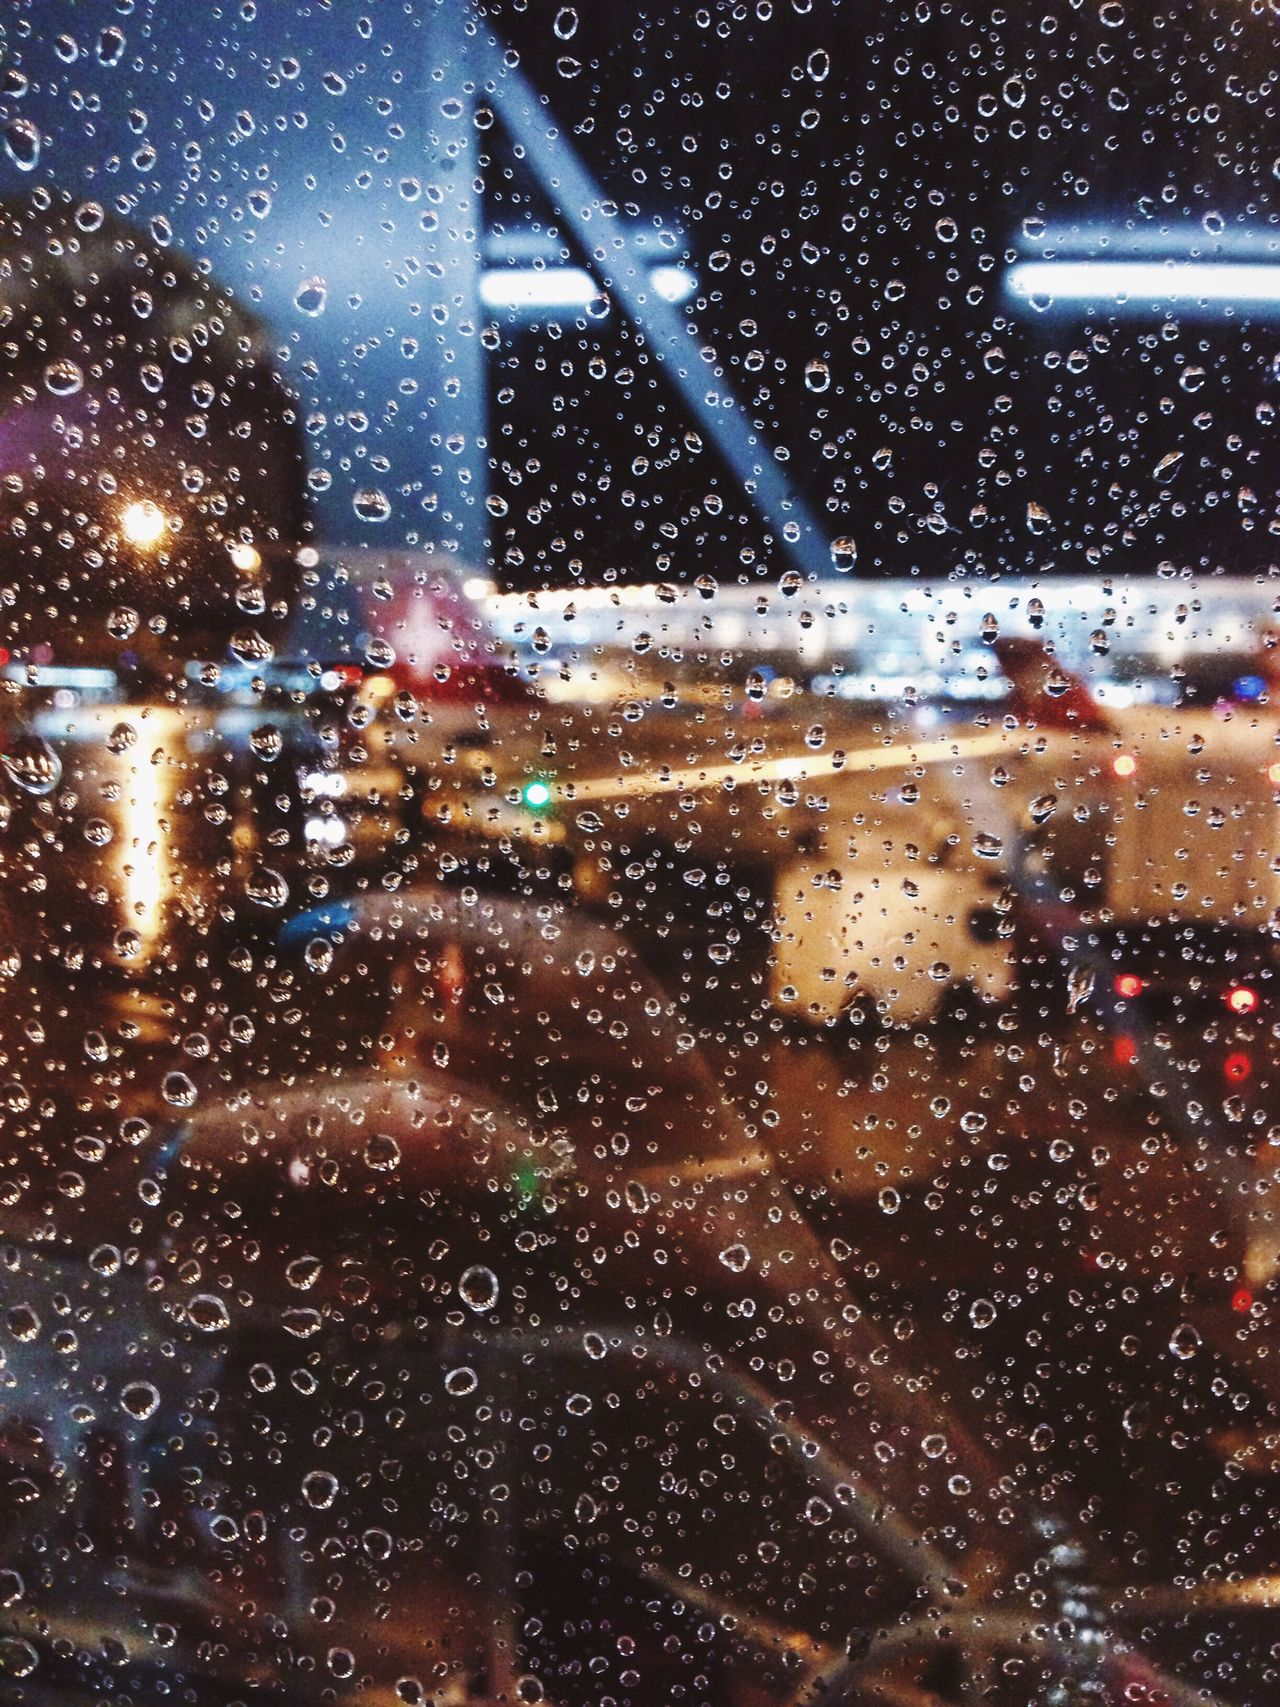 Window Rain Wet Transportation Mode Of Transport Close-up Land Vehicle Road Day Rainy Season No People Water RainDrop Indoors